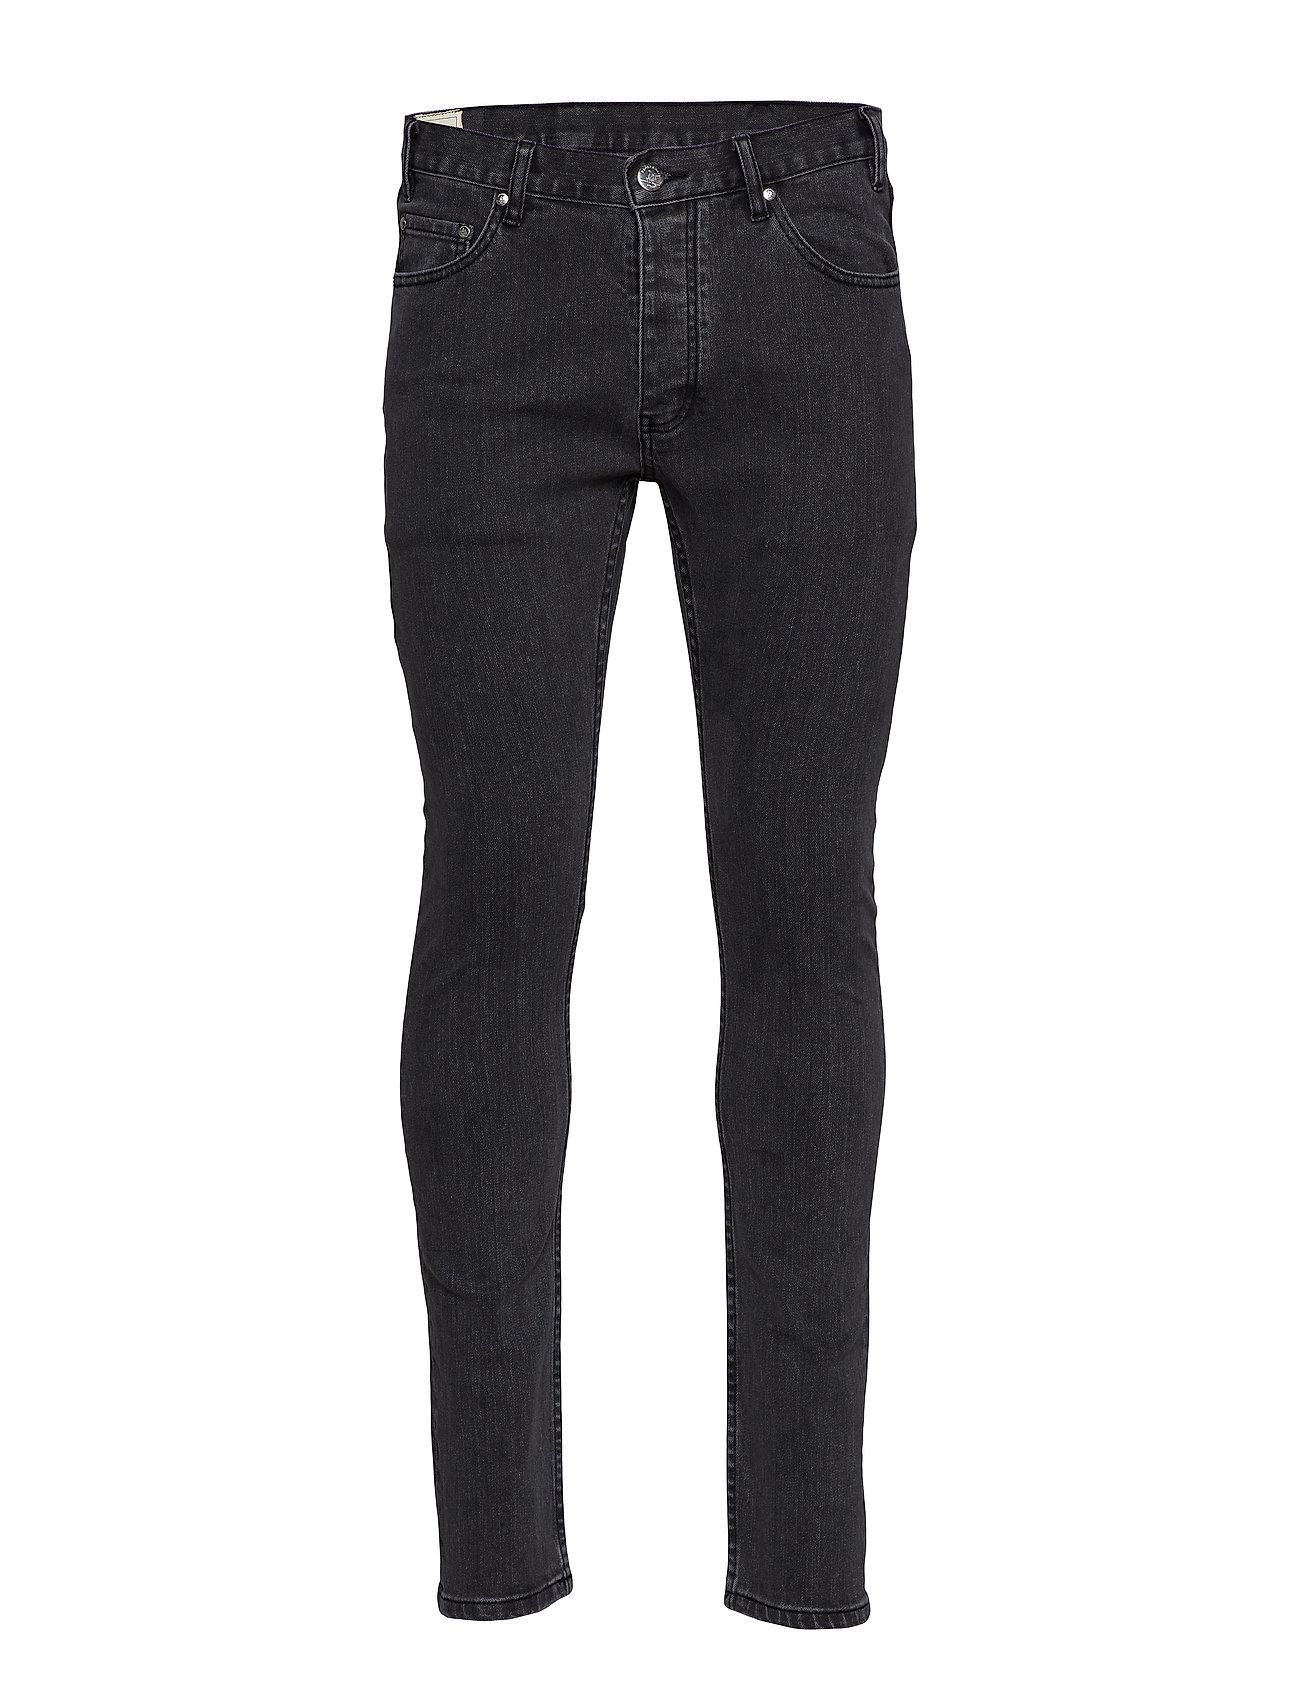 HAN Kjøbenhavn Lean Fit Jeans - BLACK STONE WASH